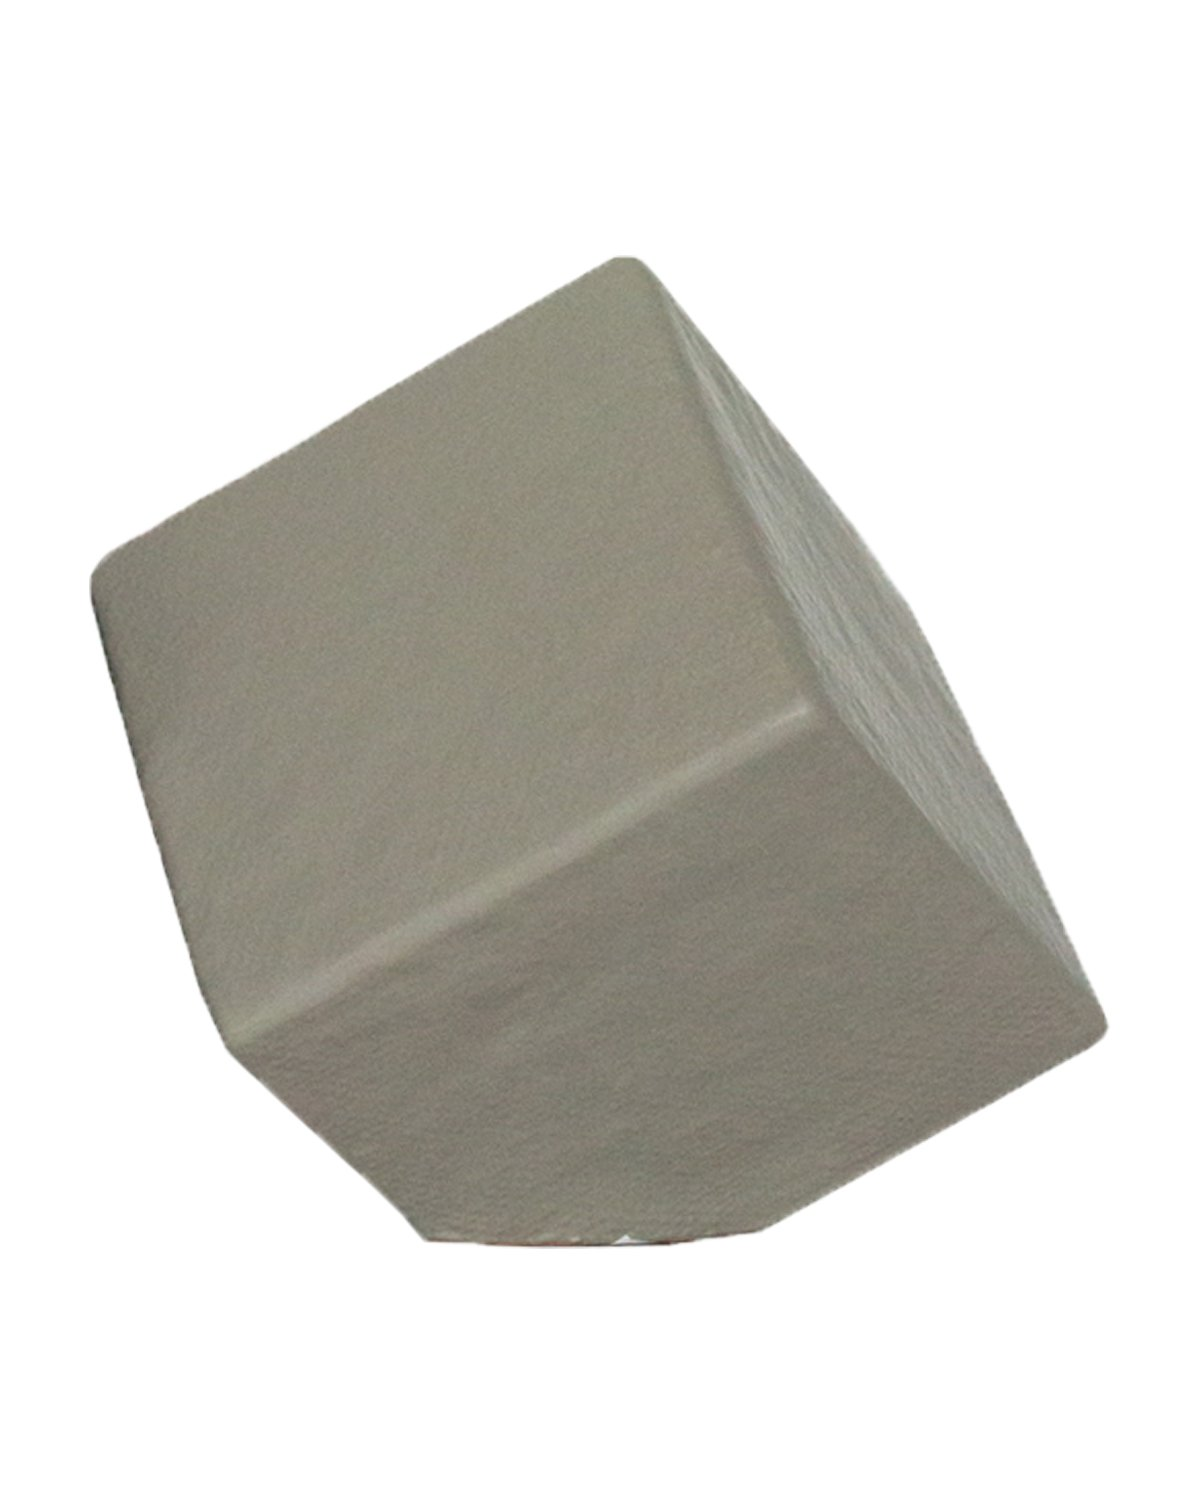 Textured_Cube_Object_Stone_5a47665b-5814-47bb-bd16-cae6d74b8754.jpg